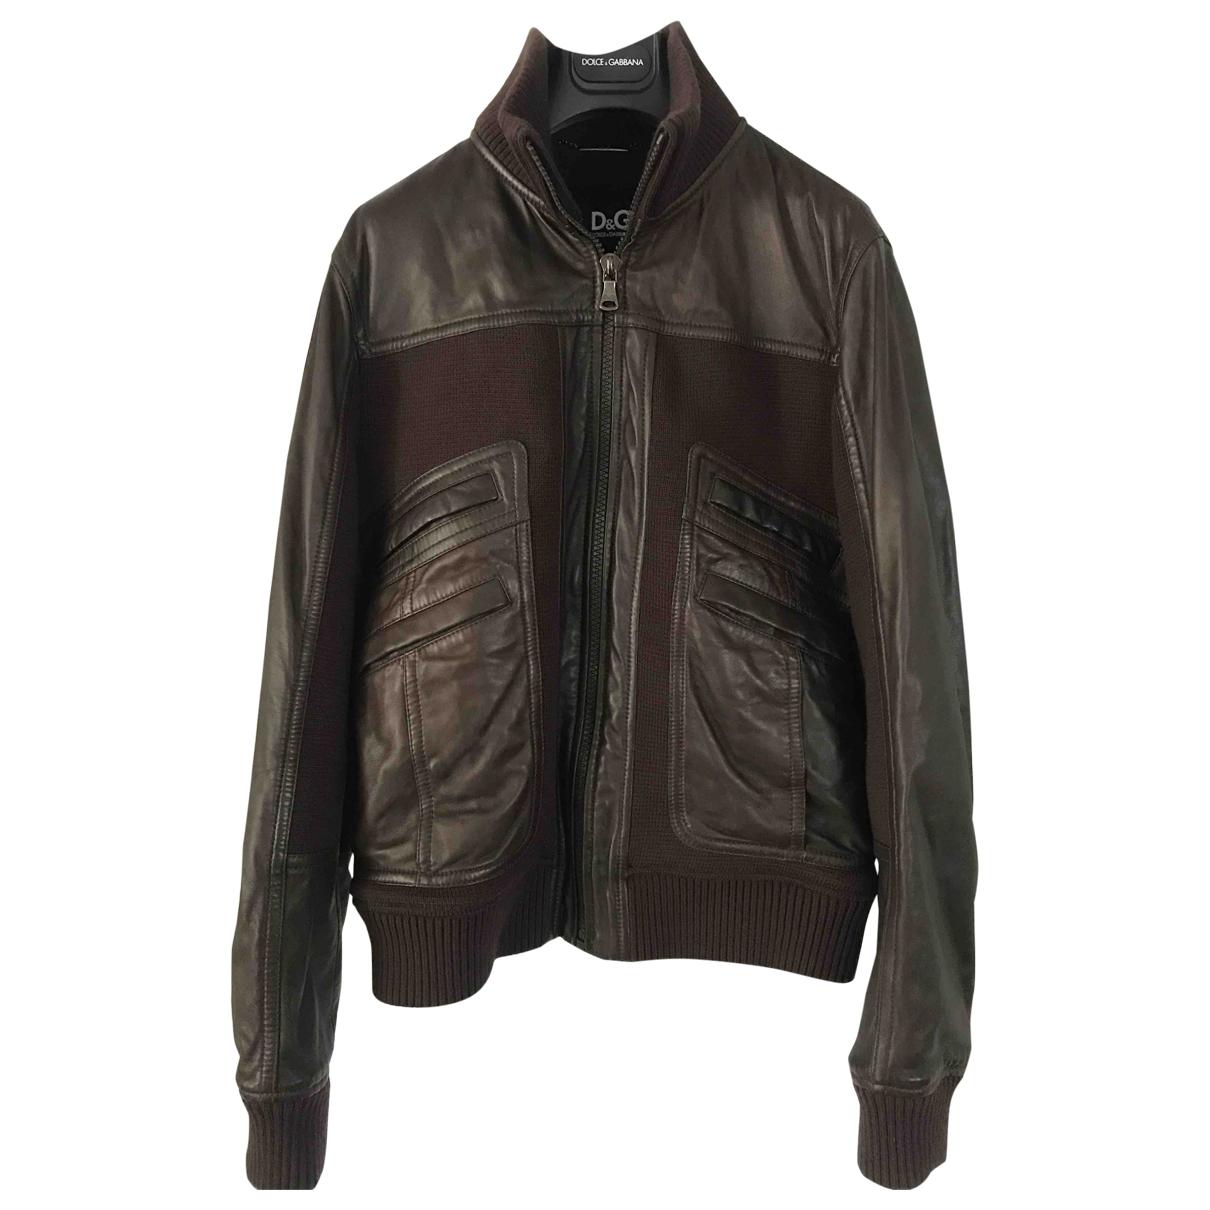 D&g \N Brown Leather jacket  for Men 50 IT